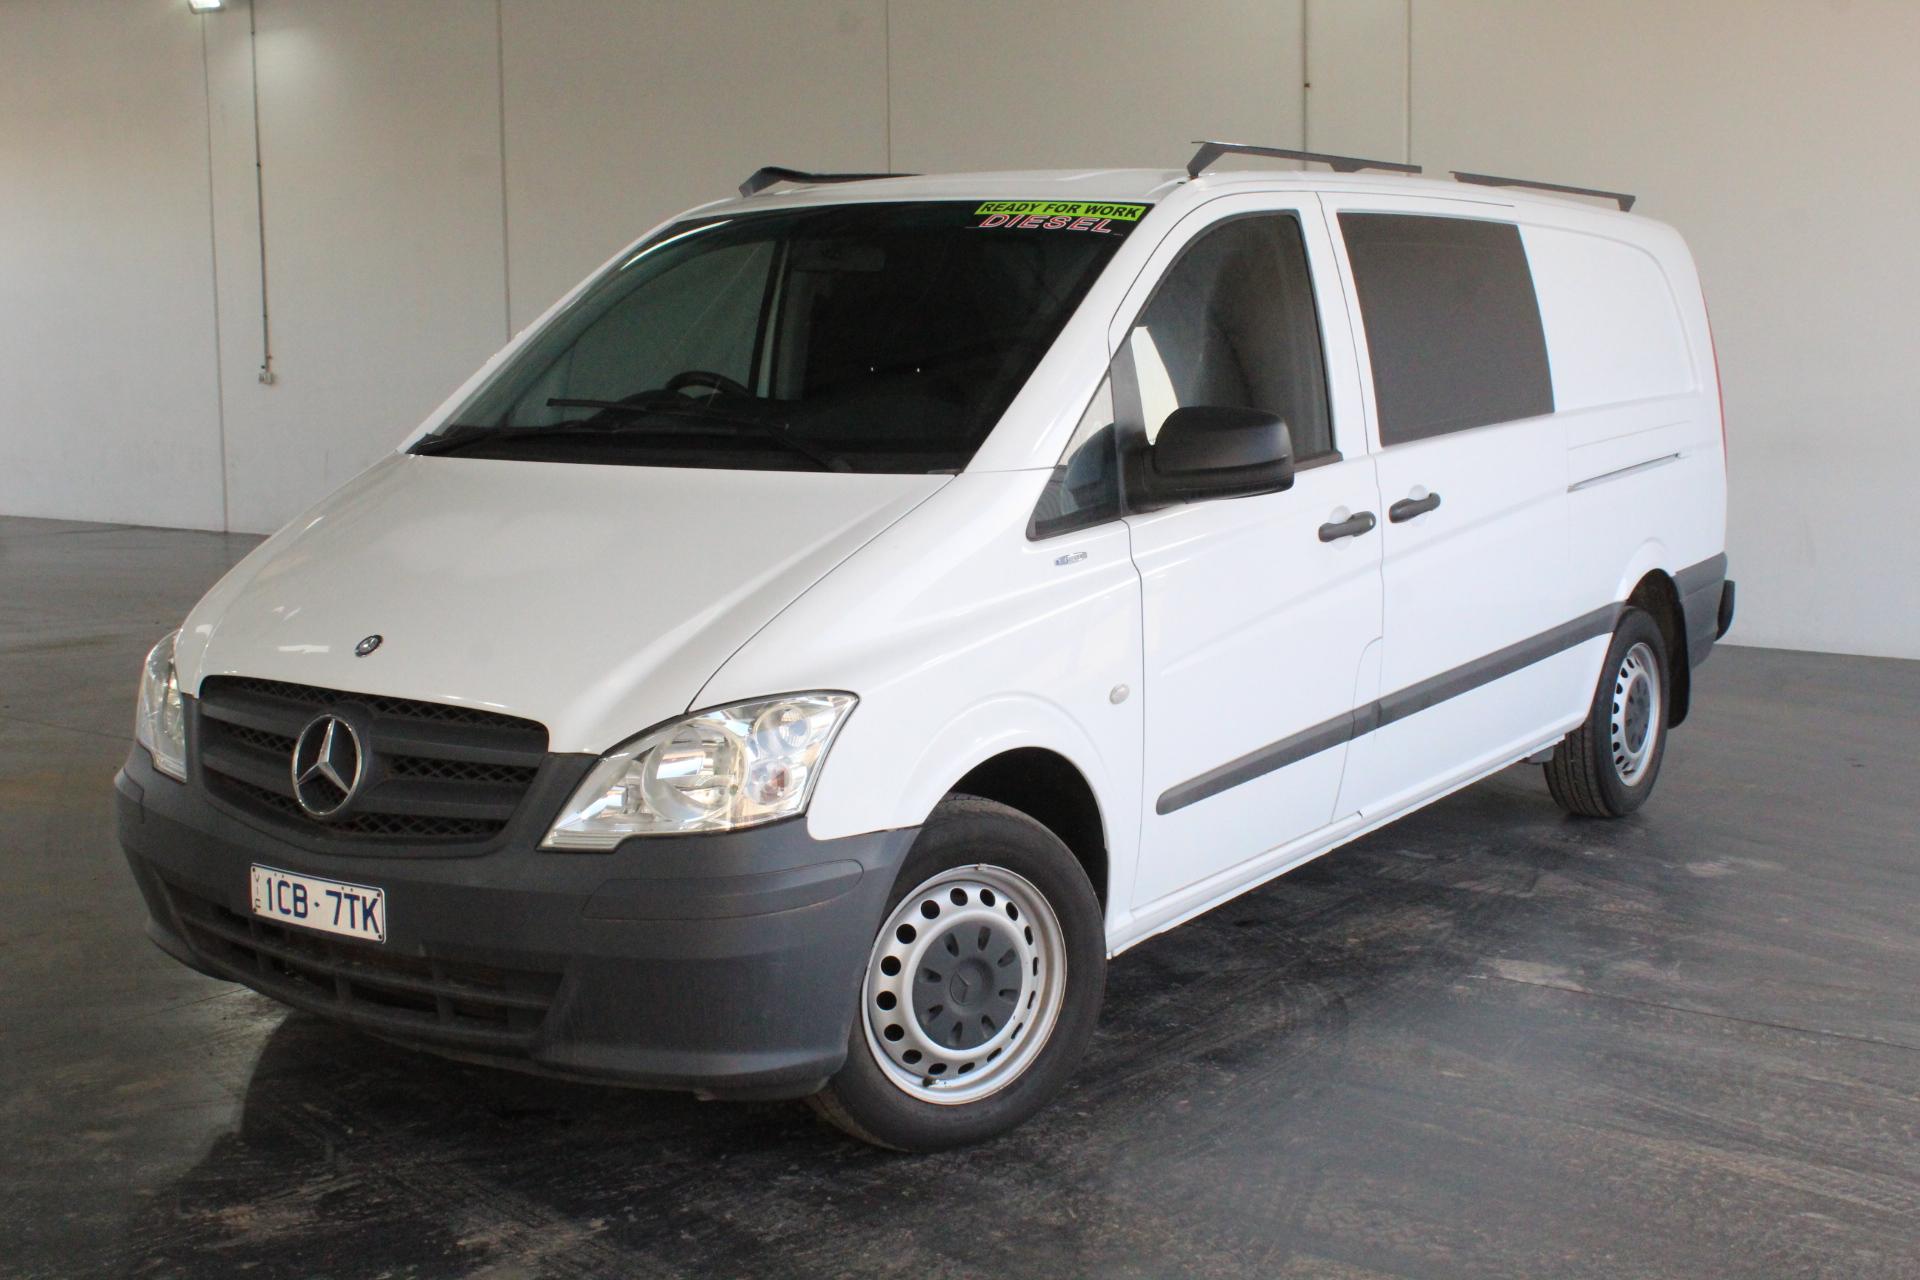 2014 Mercedes Benz Vito 113CDI LWB Turbo Diesel Manual Van